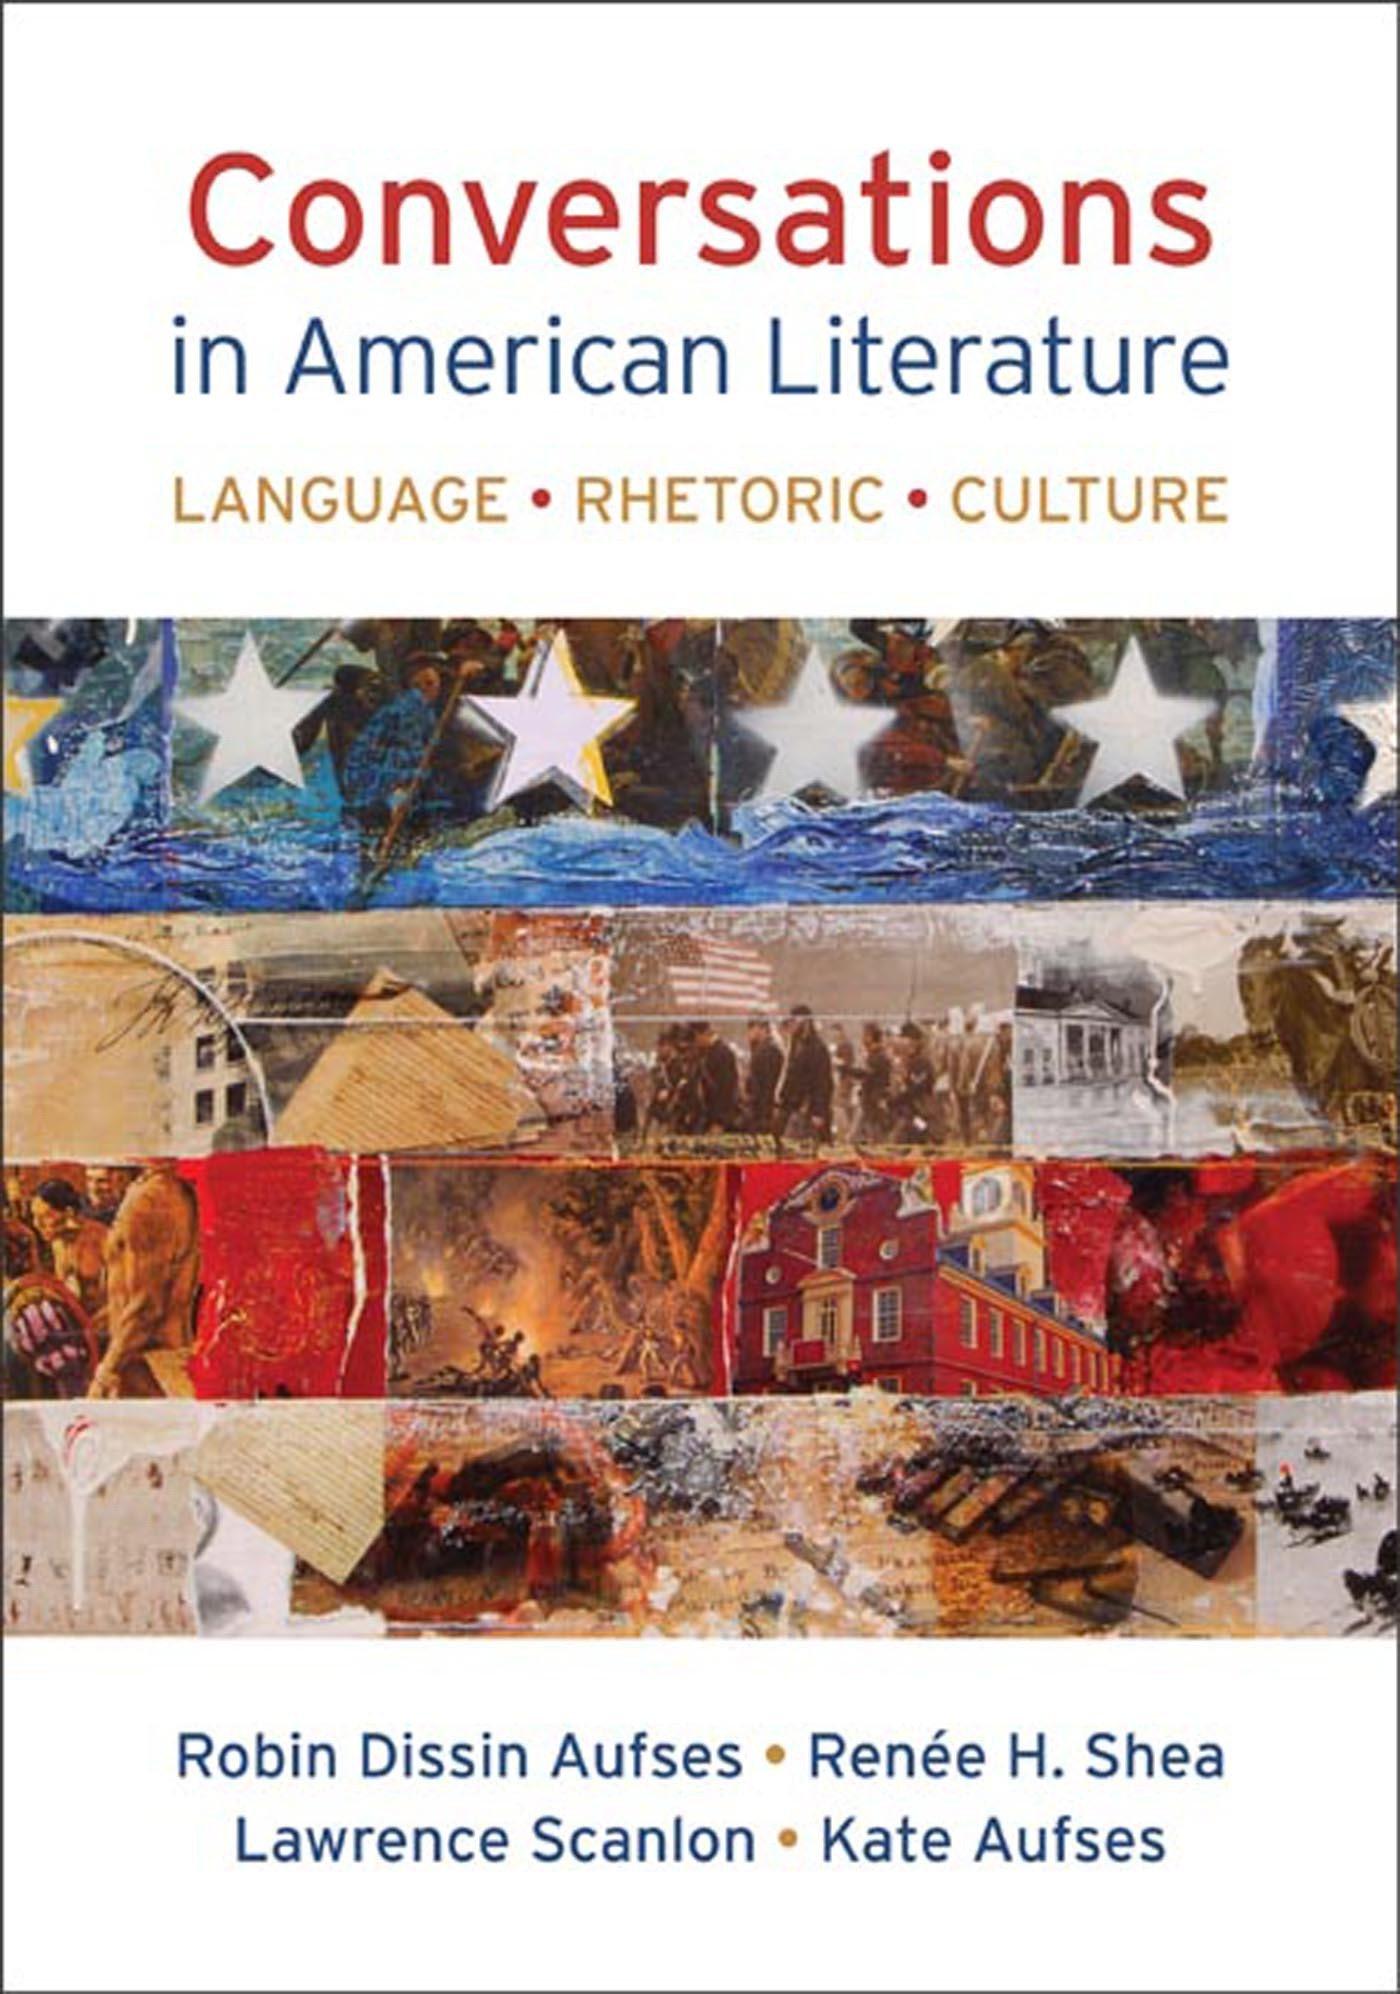 Conversations in American Literature: Language, Rhetoric, Culture by Bedford/St. Martin's